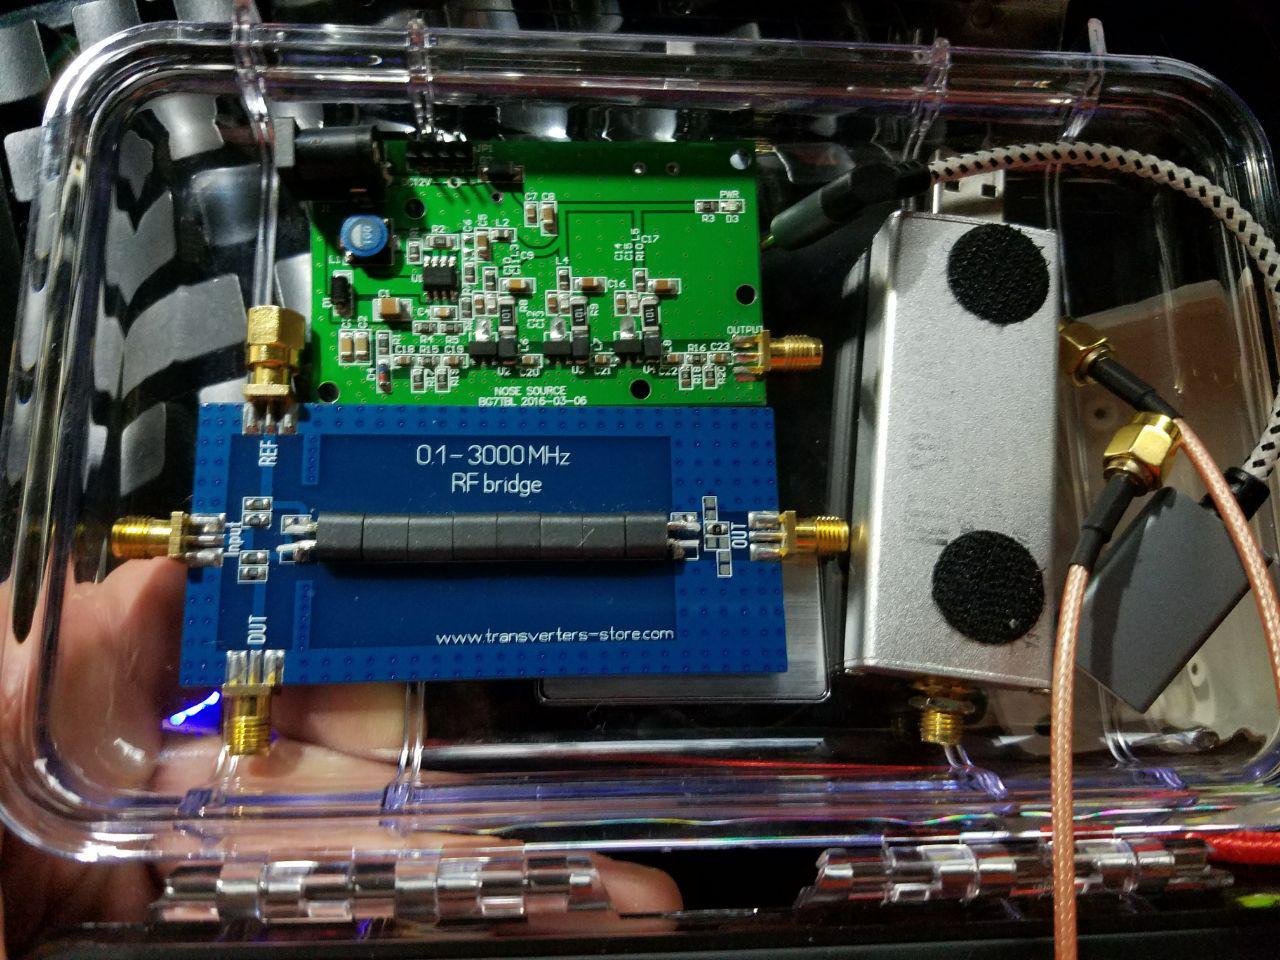 DIY Antenna Analyzer - Hardware - The Things Network